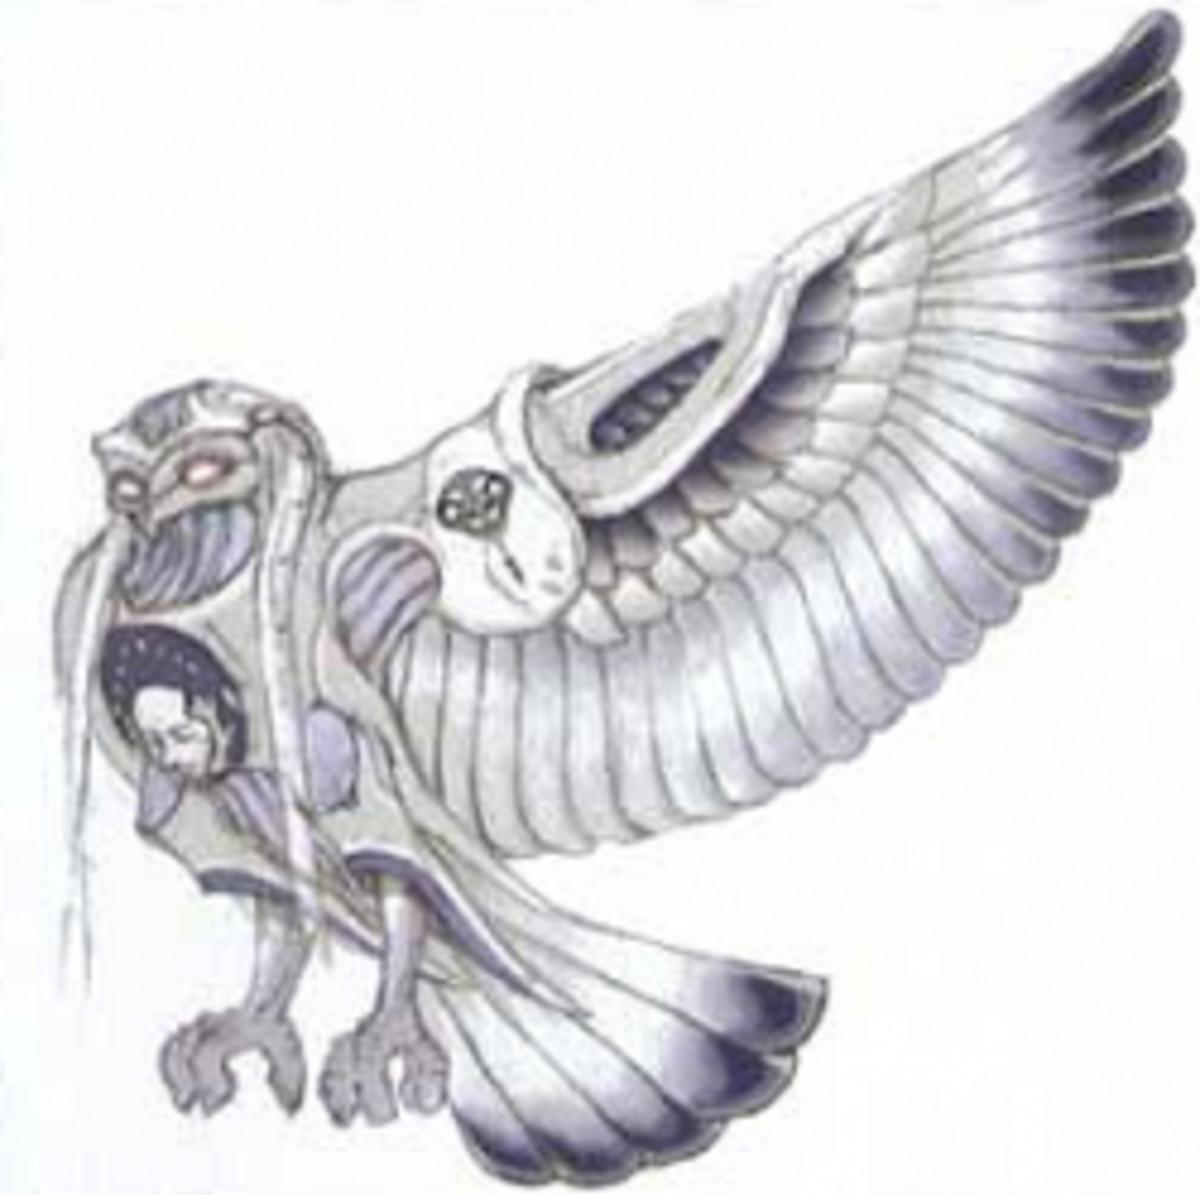 Menrva, the owl in Final Fantasy XIII